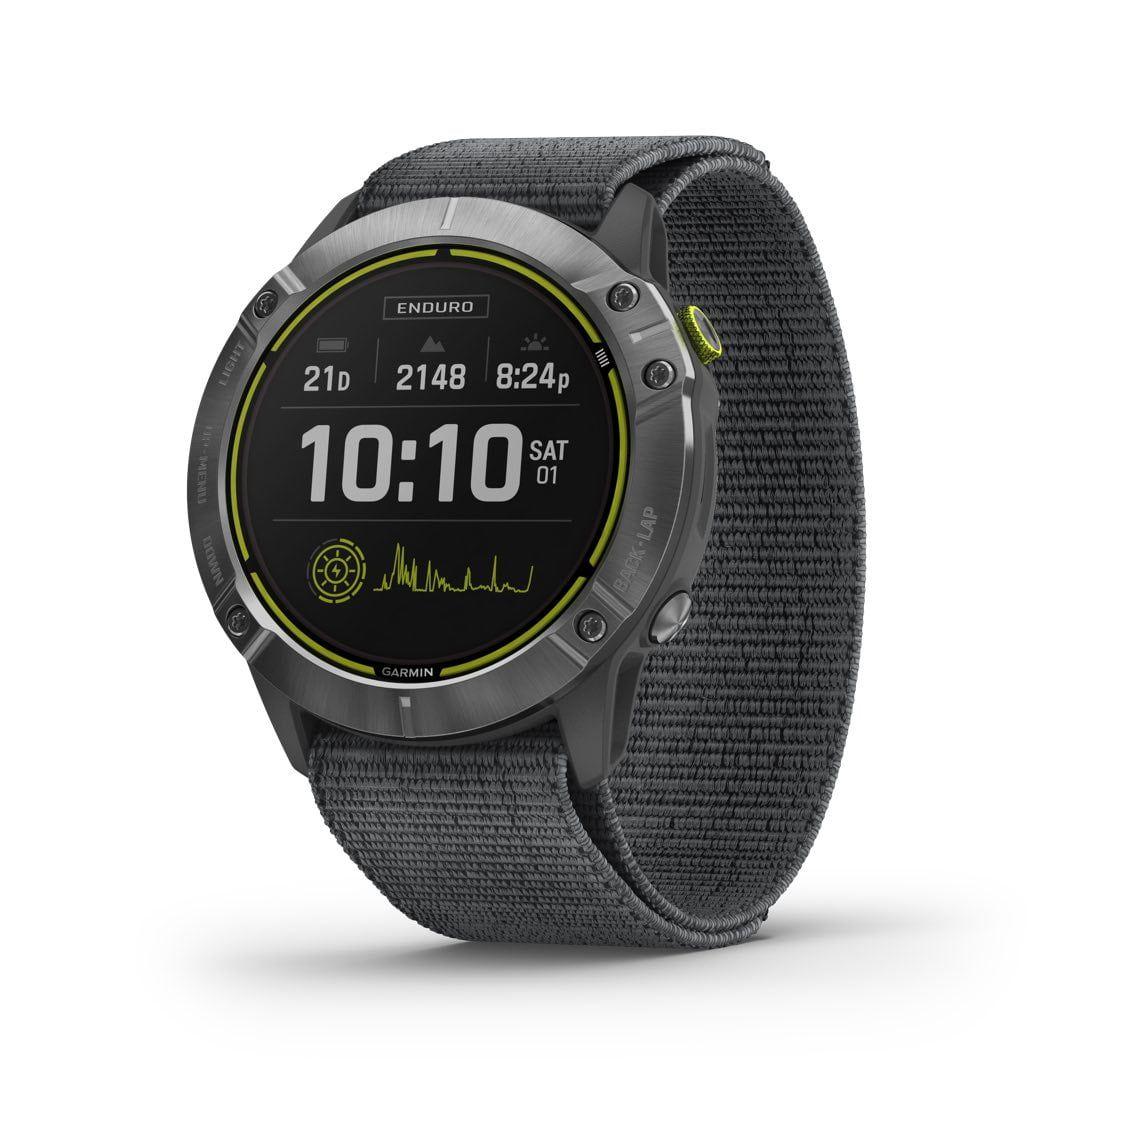 Garmin prezentuje nowy nowy zegarek – Garmin Enduro